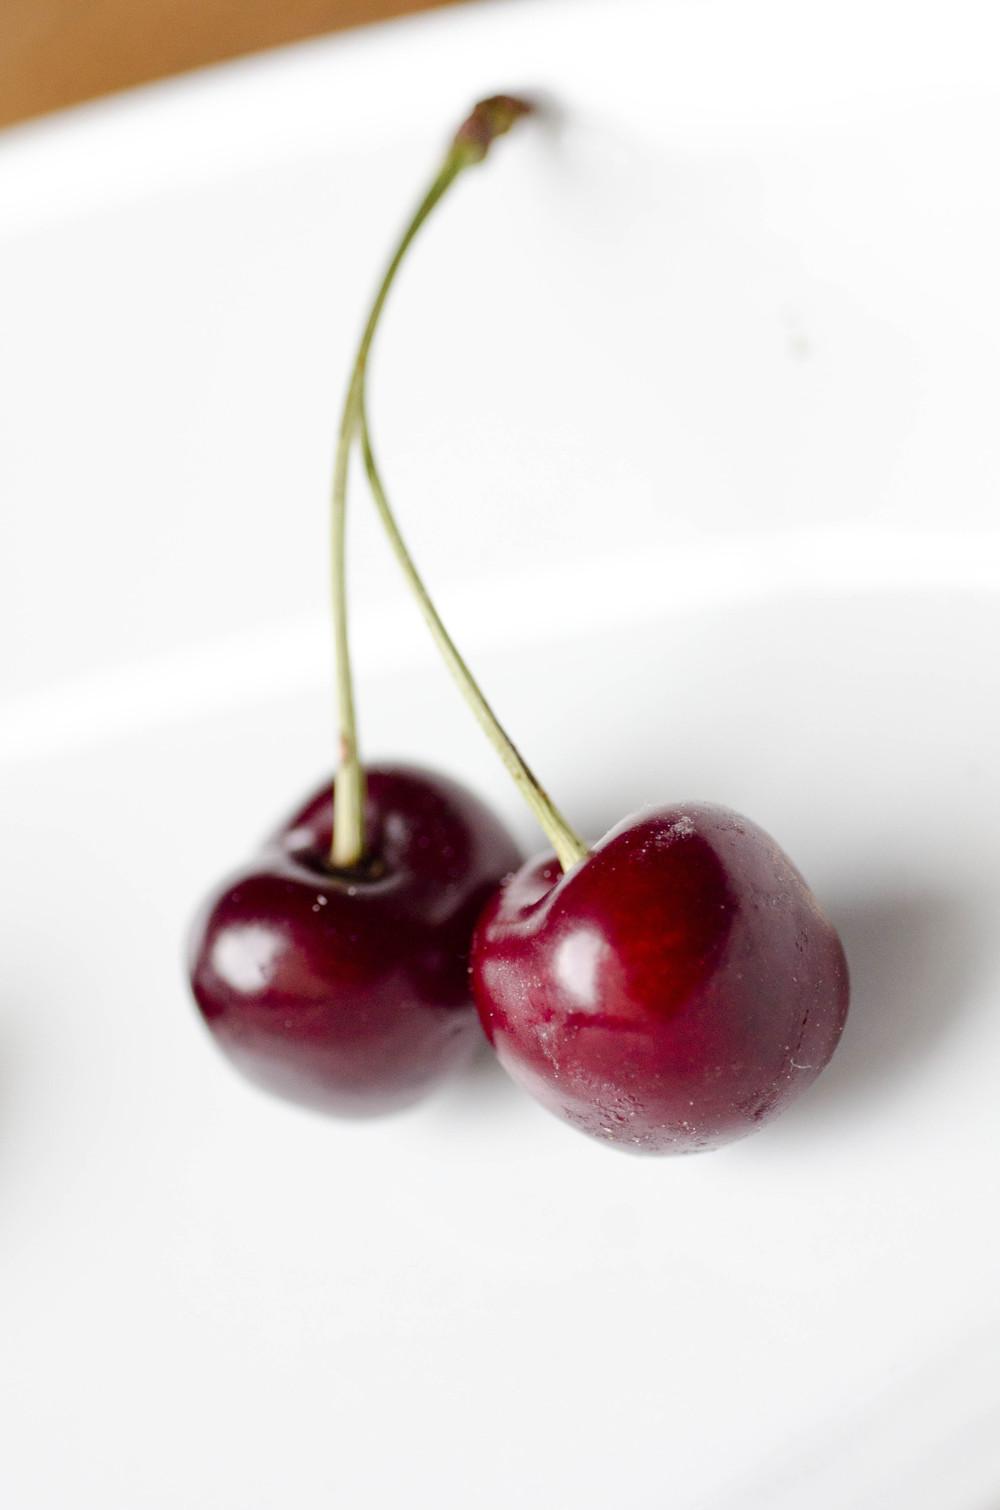 The 2011 Cherry Season